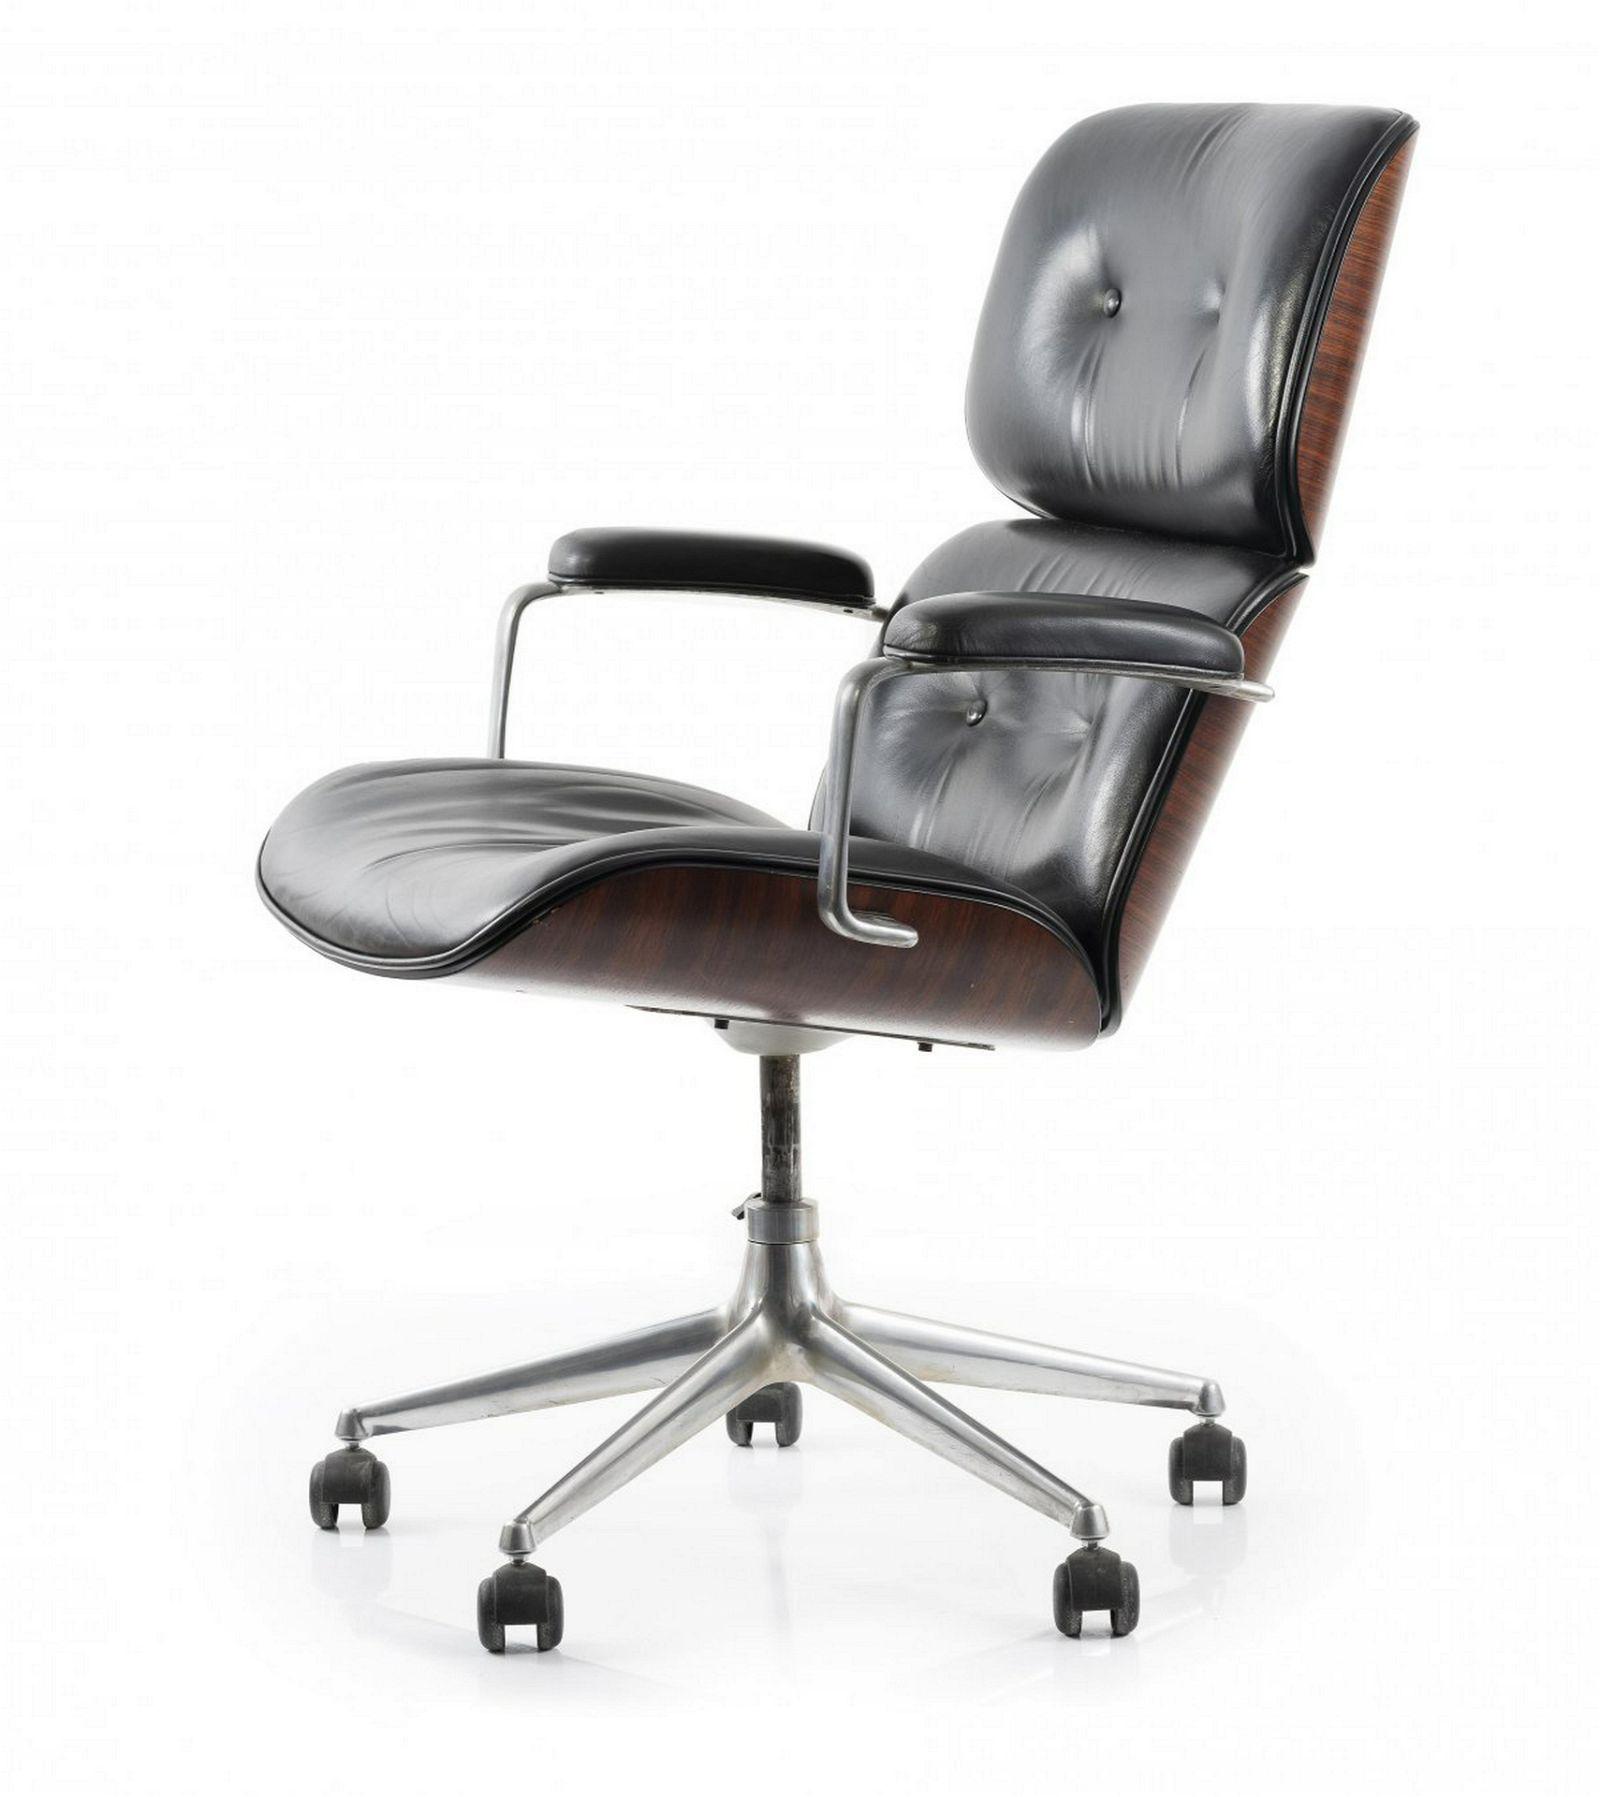 Ico Parisi (attr.), Desk chair, c. 1965